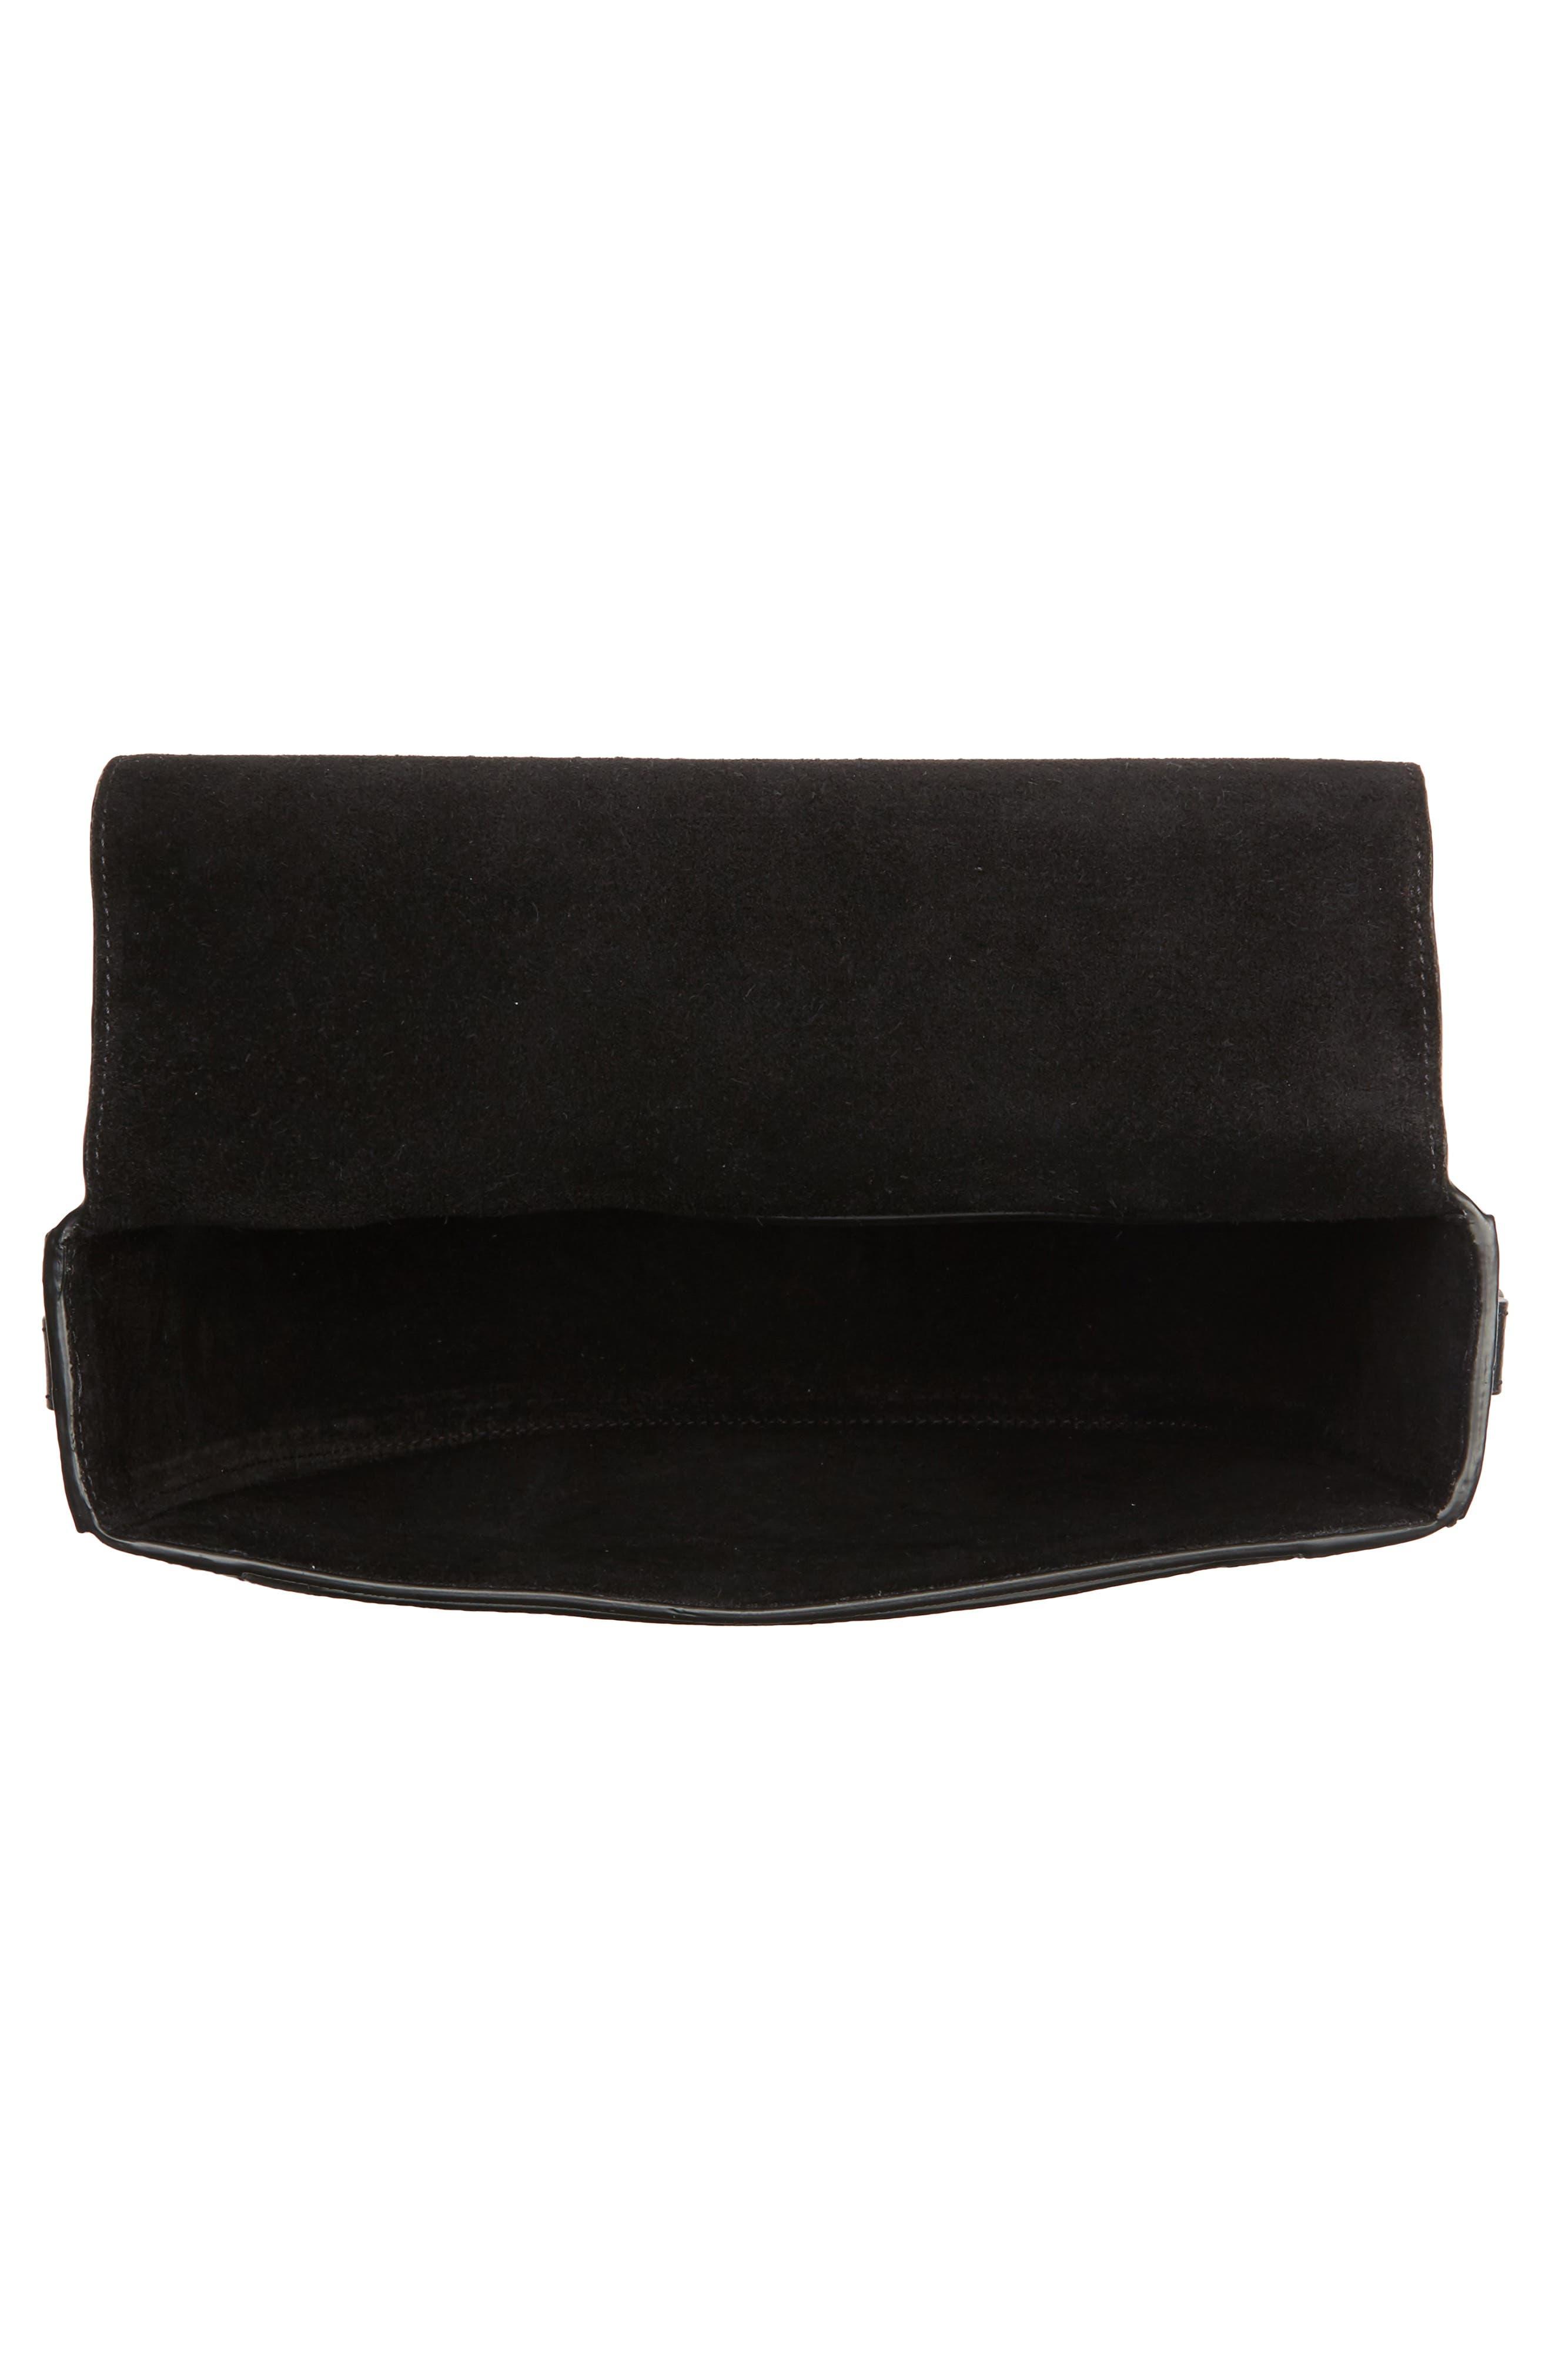 Tenby Calfskin Leather Crossbody Bag,                             Alternate thumbnail 4, color,                             001